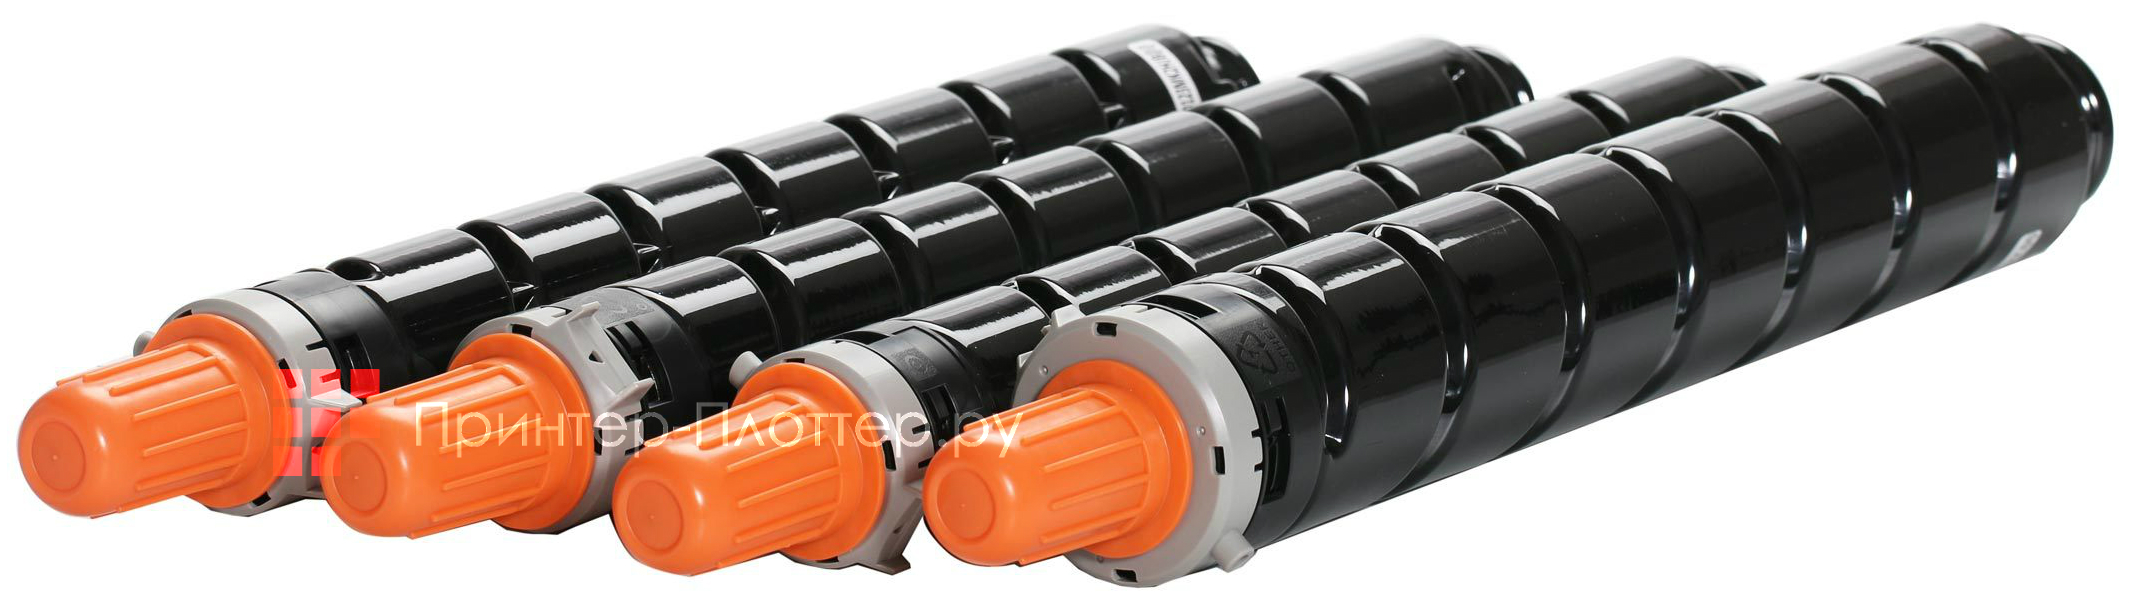 Canon imageRUNNER ADVANCE C5045i. Тонер C-EXV28